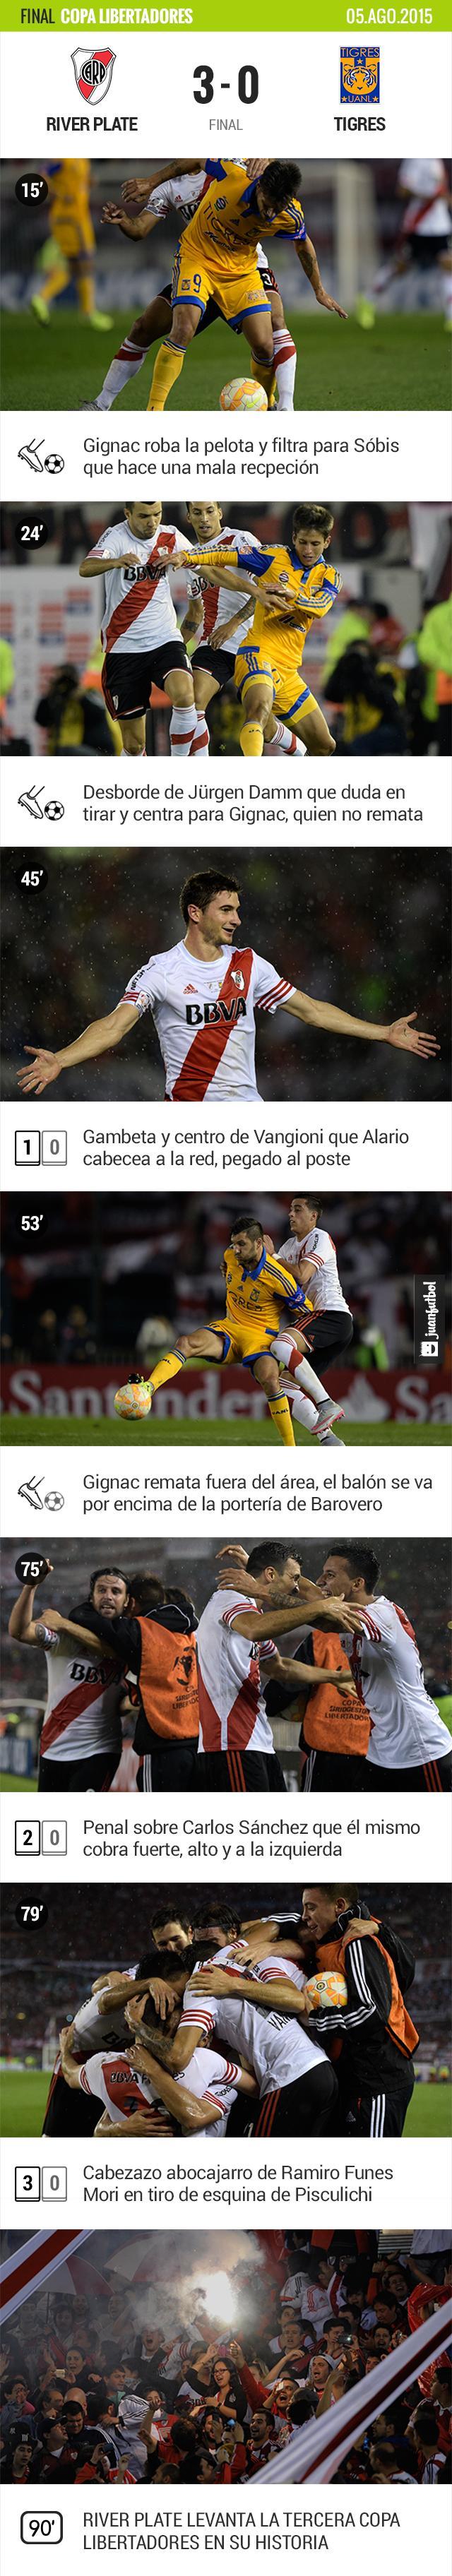 River Plate 3-0 Tigres